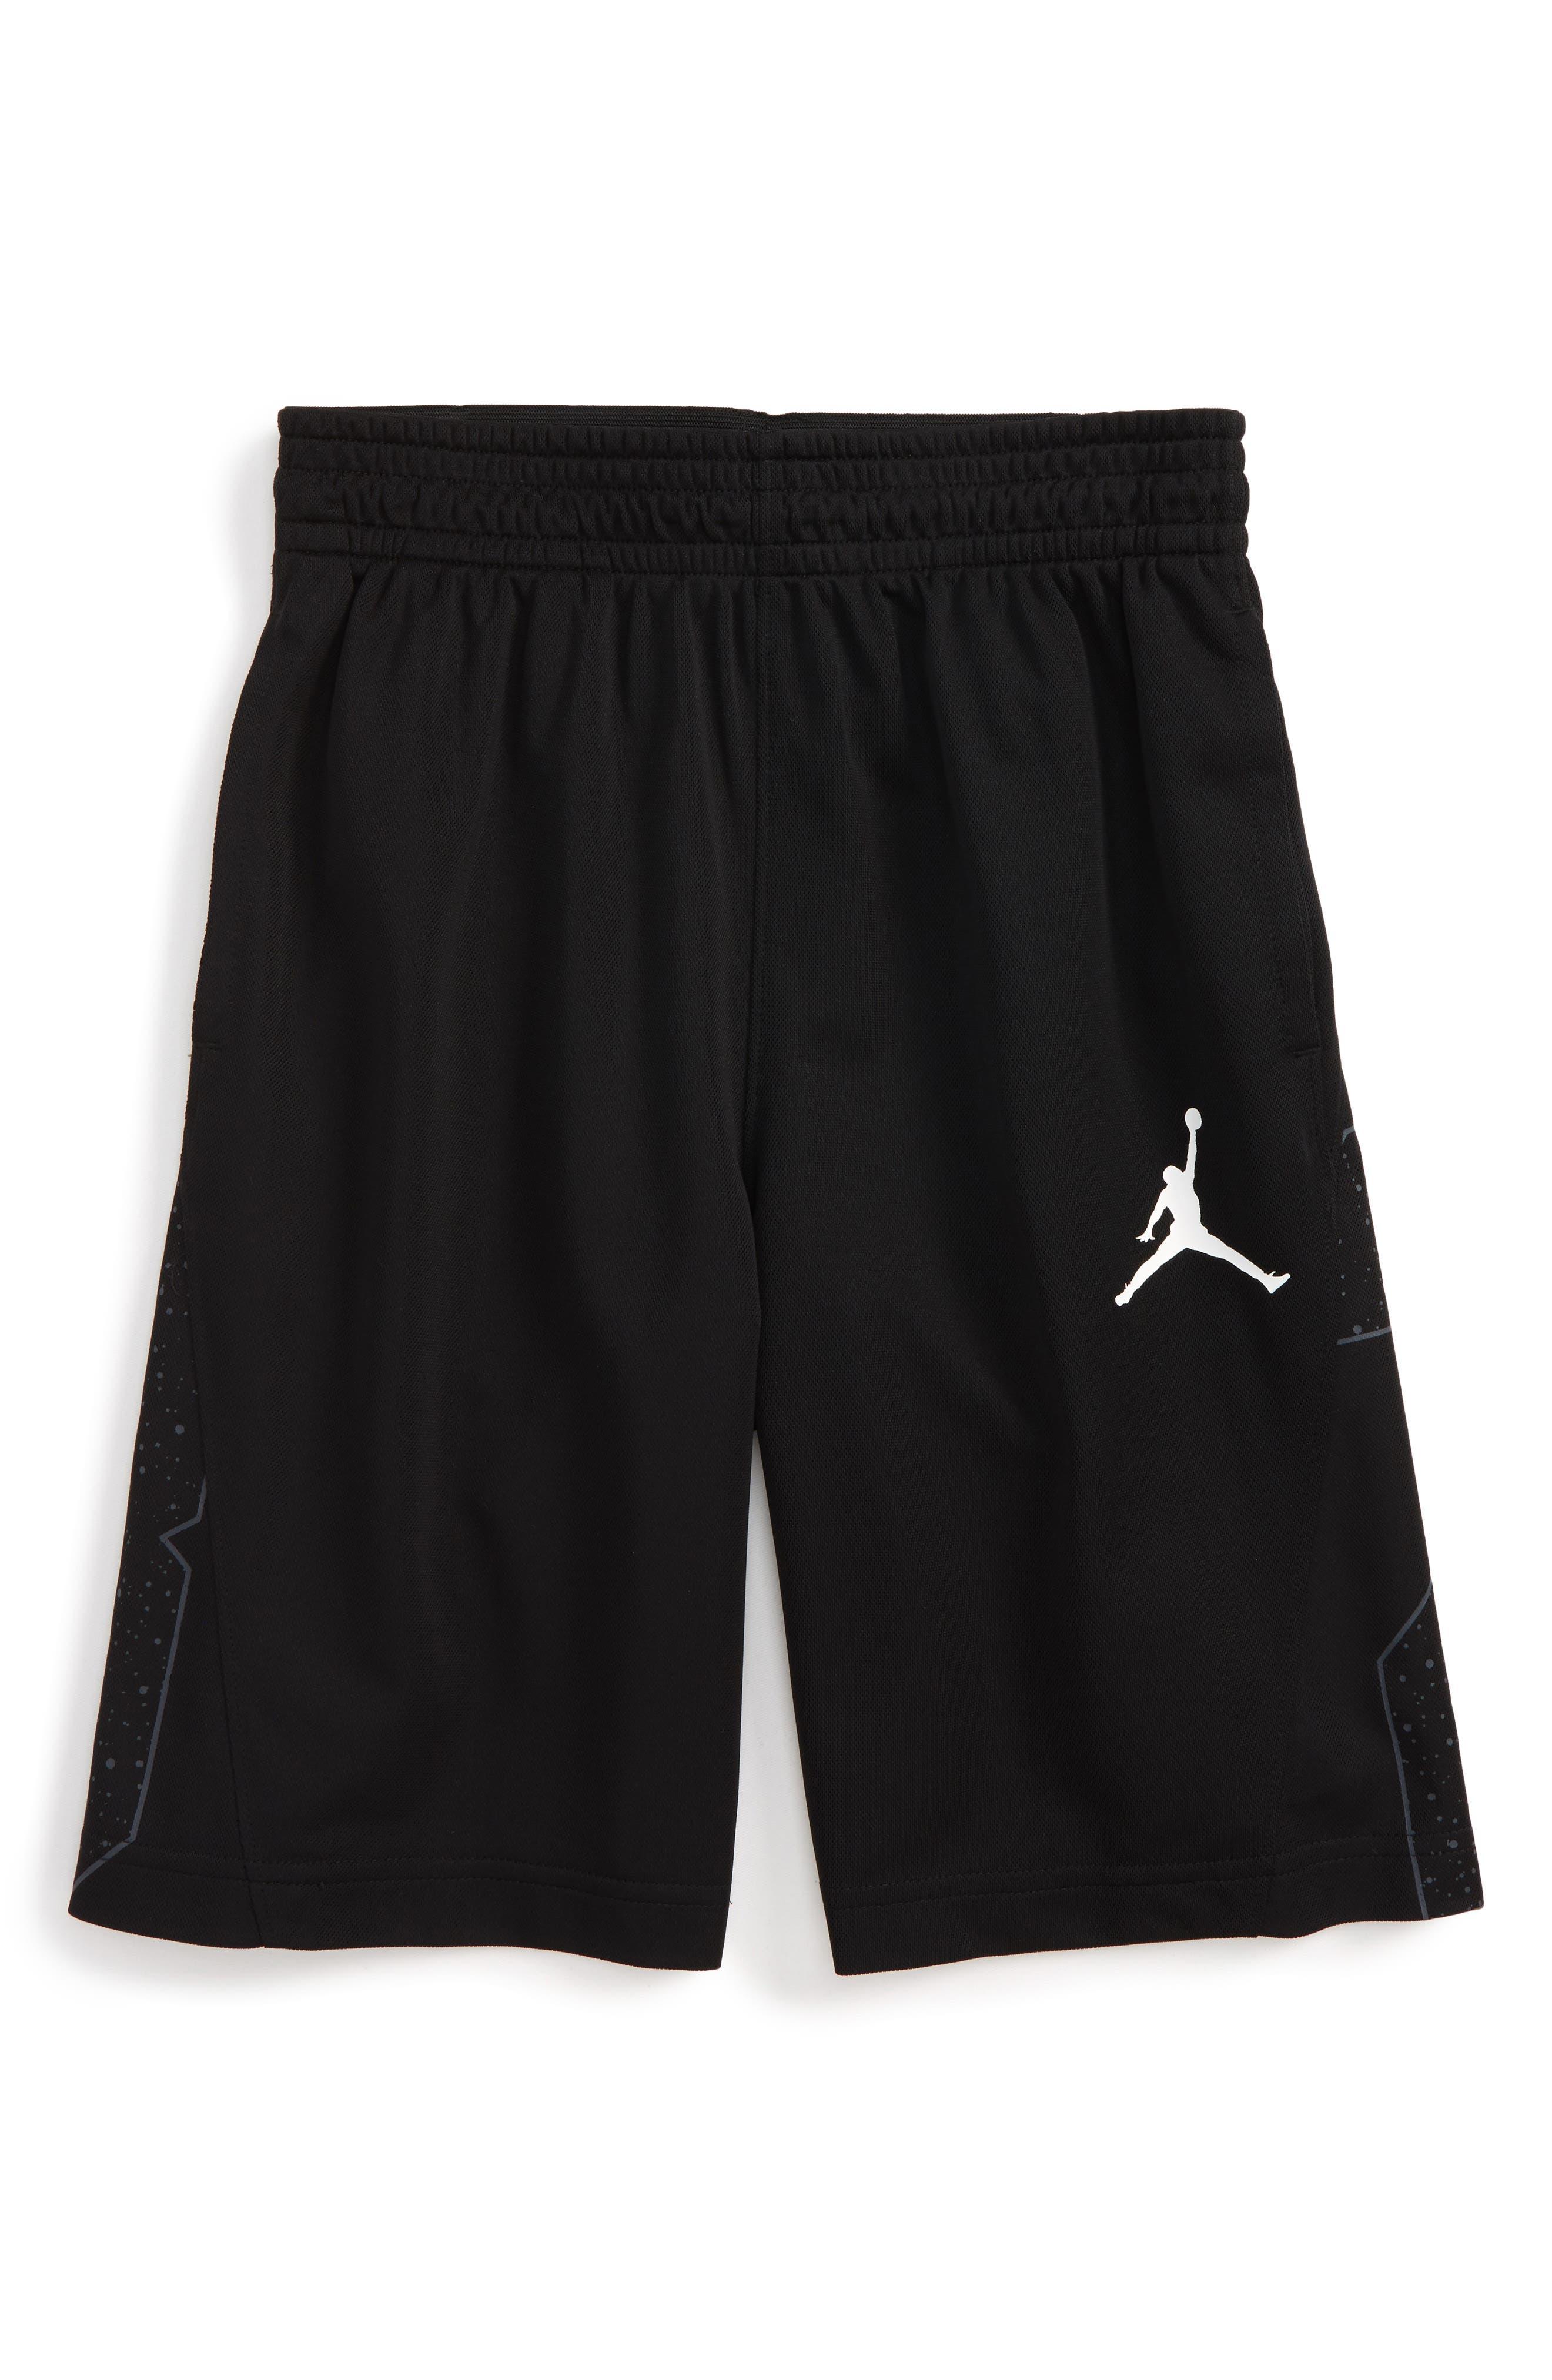 Jordan Speckle 23 Basketball Shorts,                             Main thumbnail 1, color,                             004